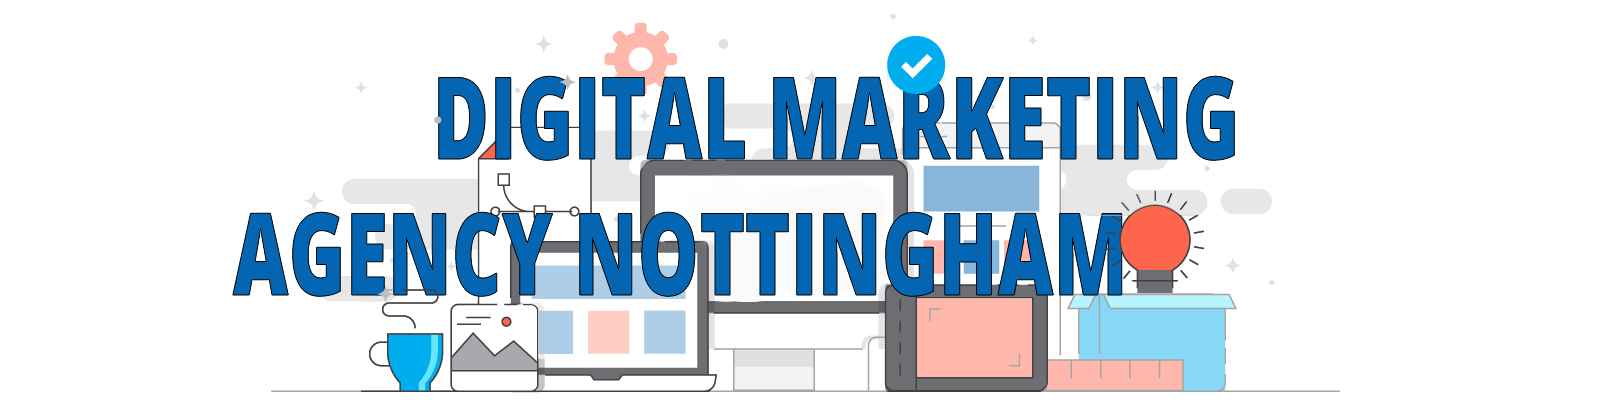 seek social digital marketing agency nottingham header with transparent background